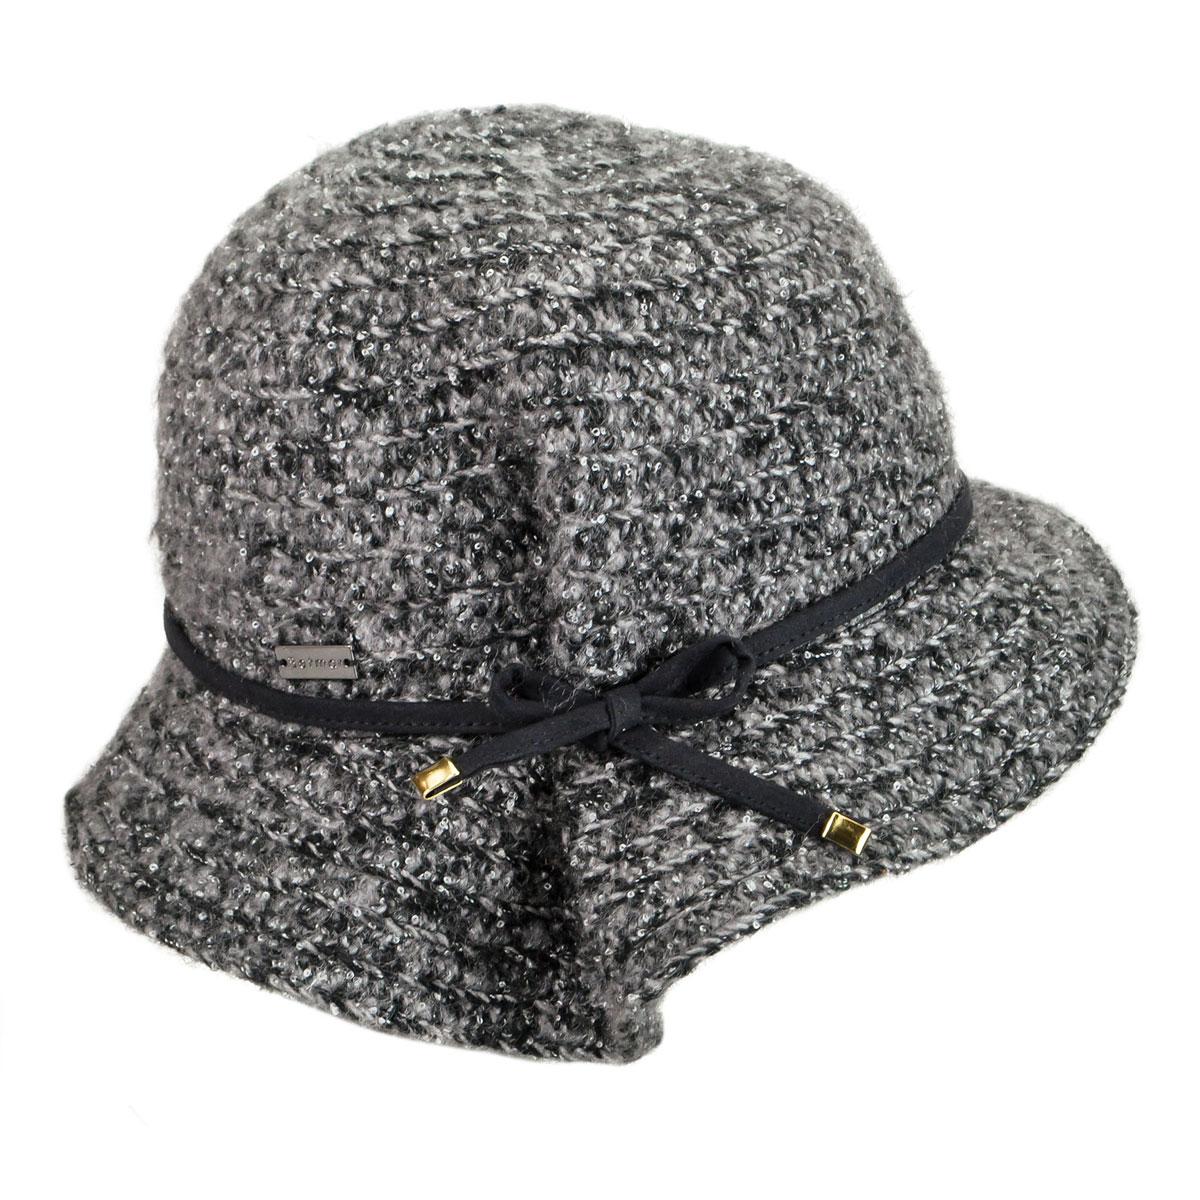 Retro Vintage Style Hats Ashley Braided Cloche $50.00 AT vintagedancer.com